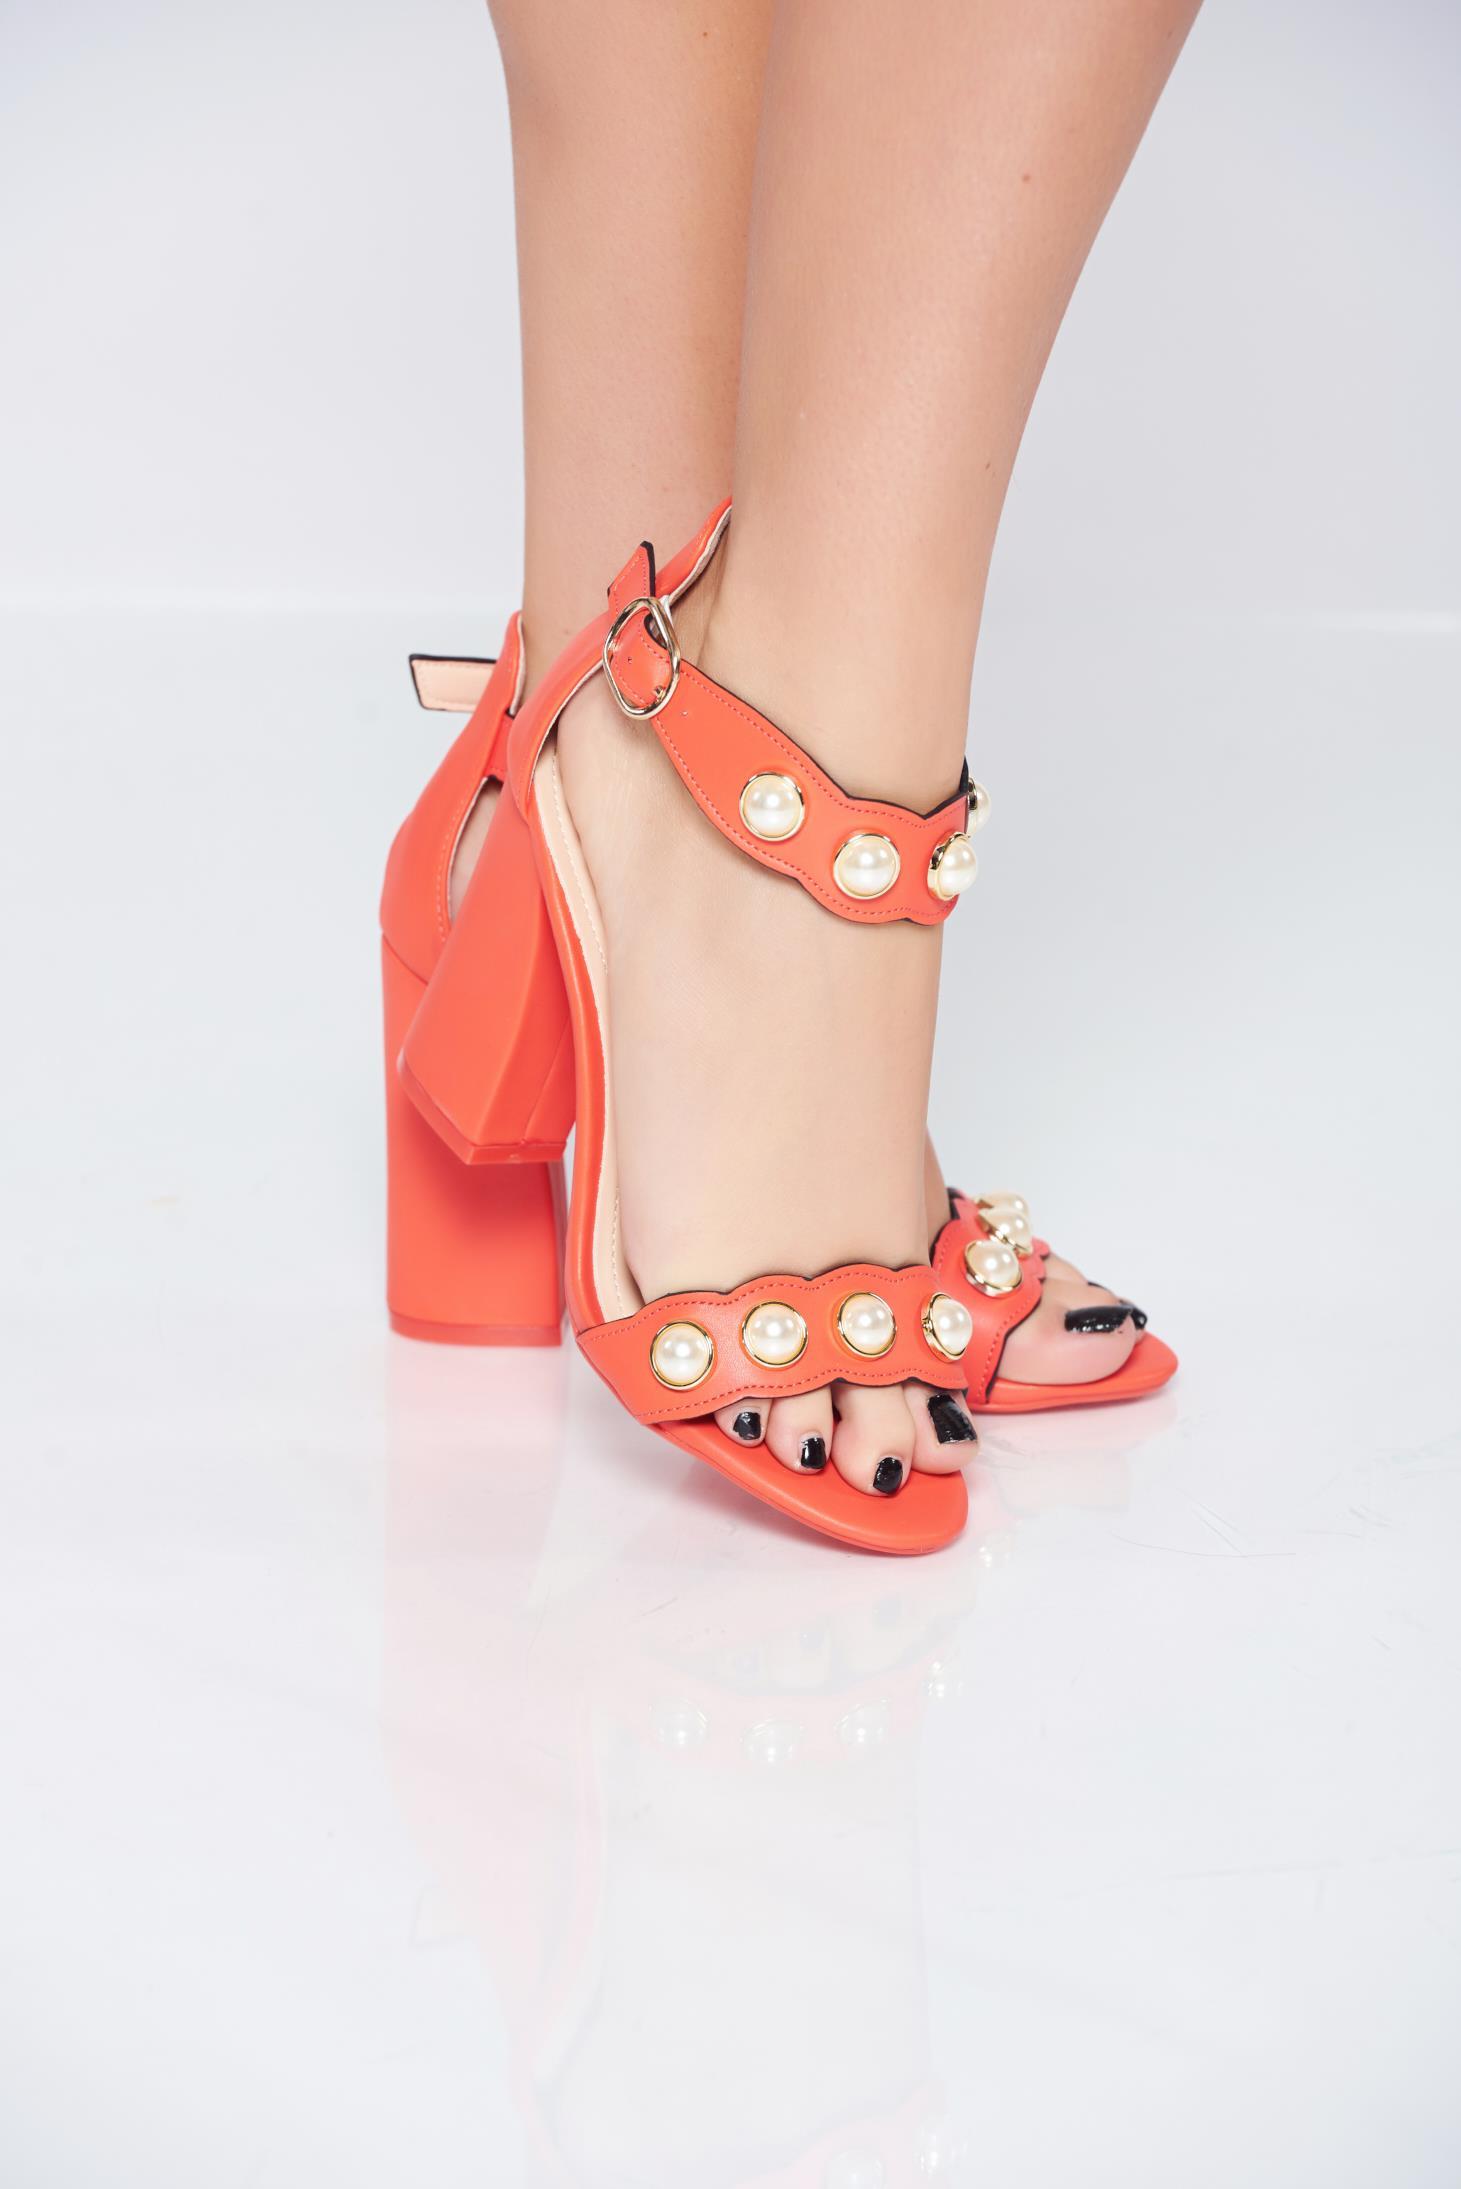 Sandale corai cu toc inalt din piele ecologica cu aplicatii cu perle